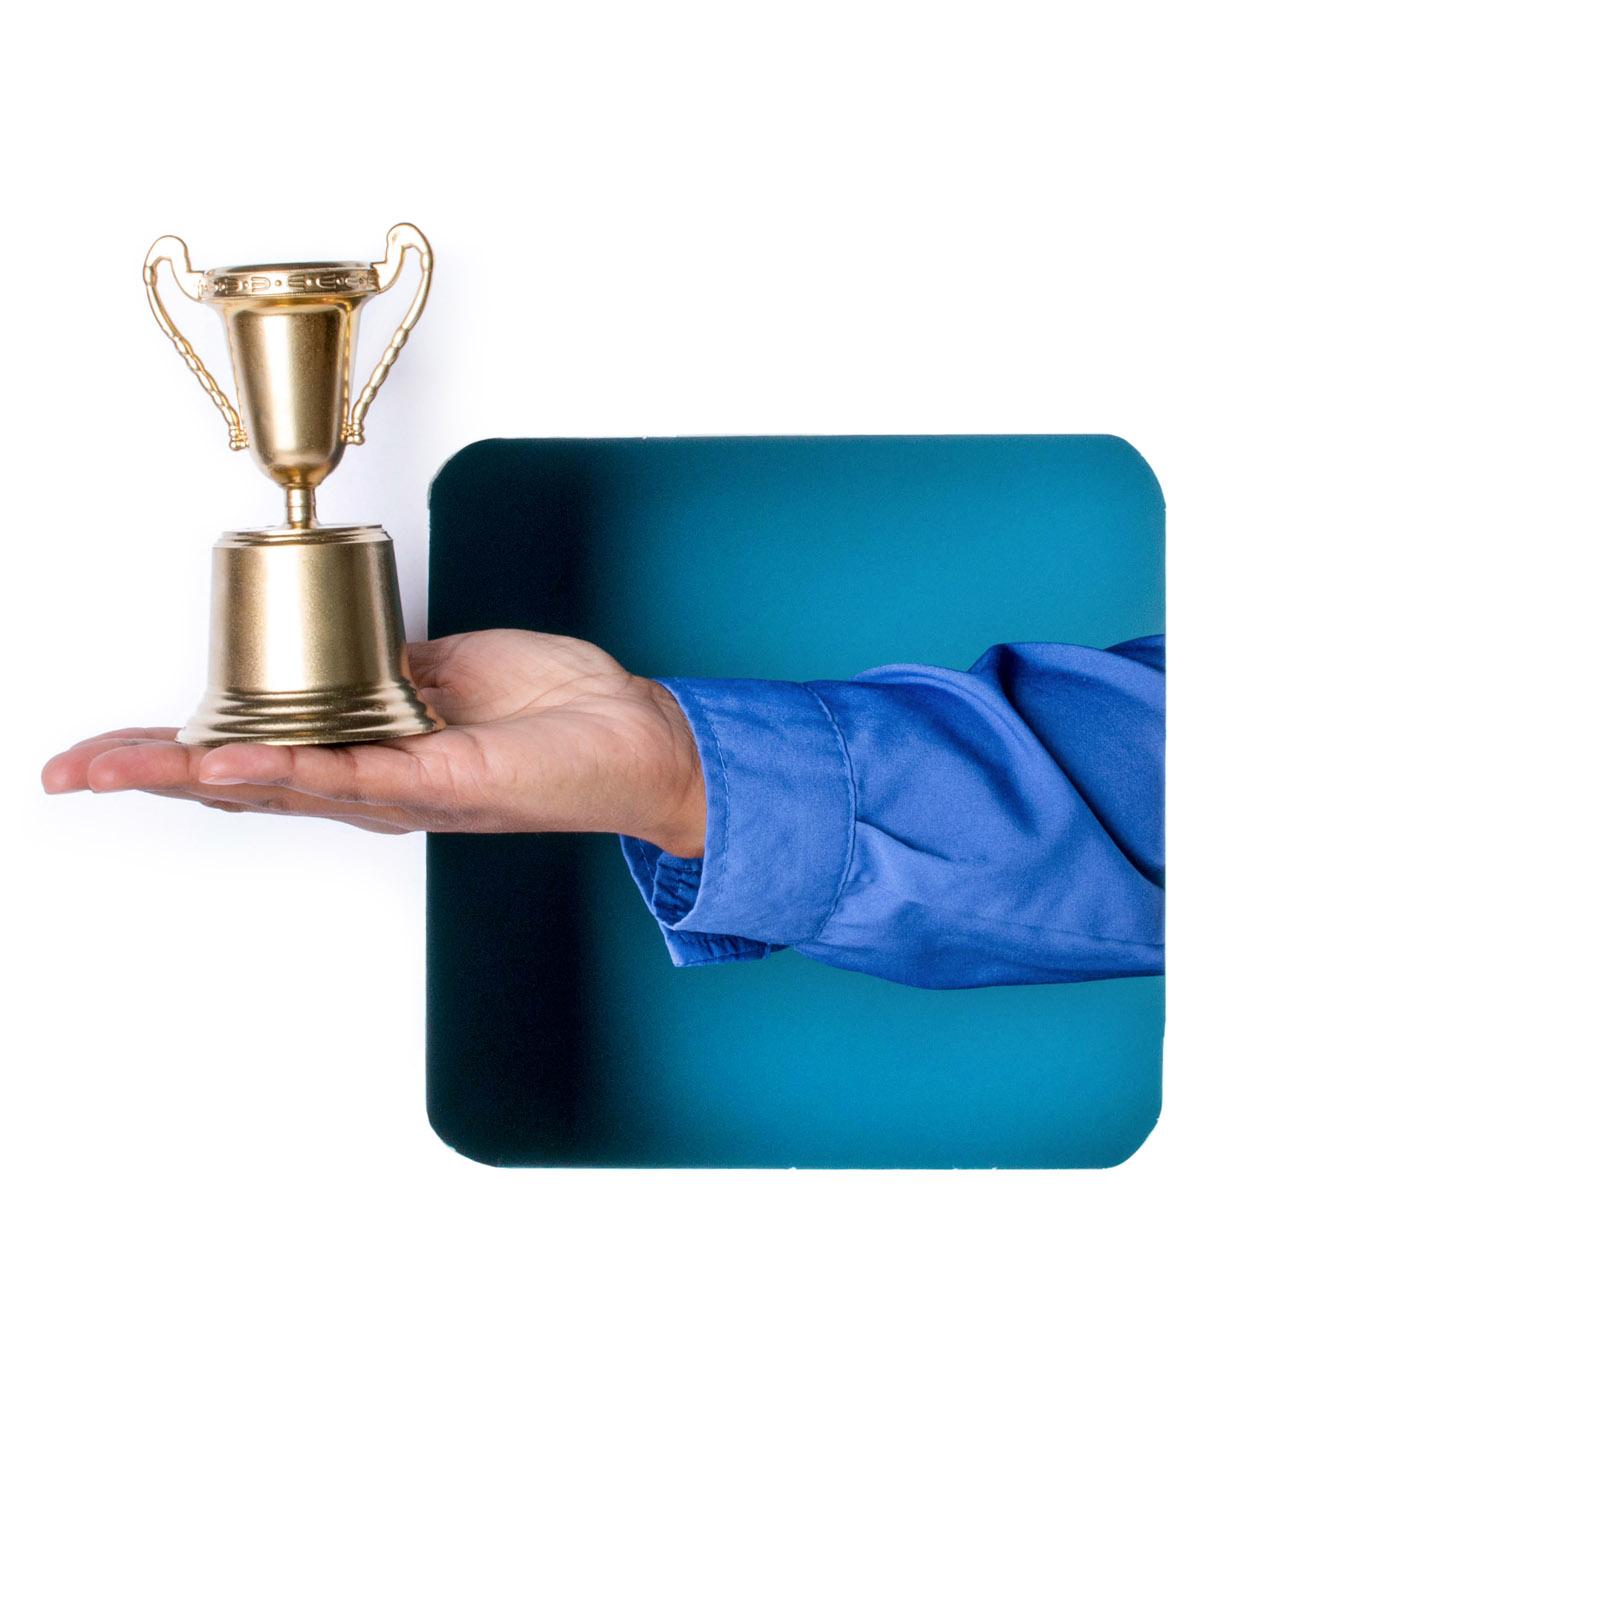 trophy-hand.jpg